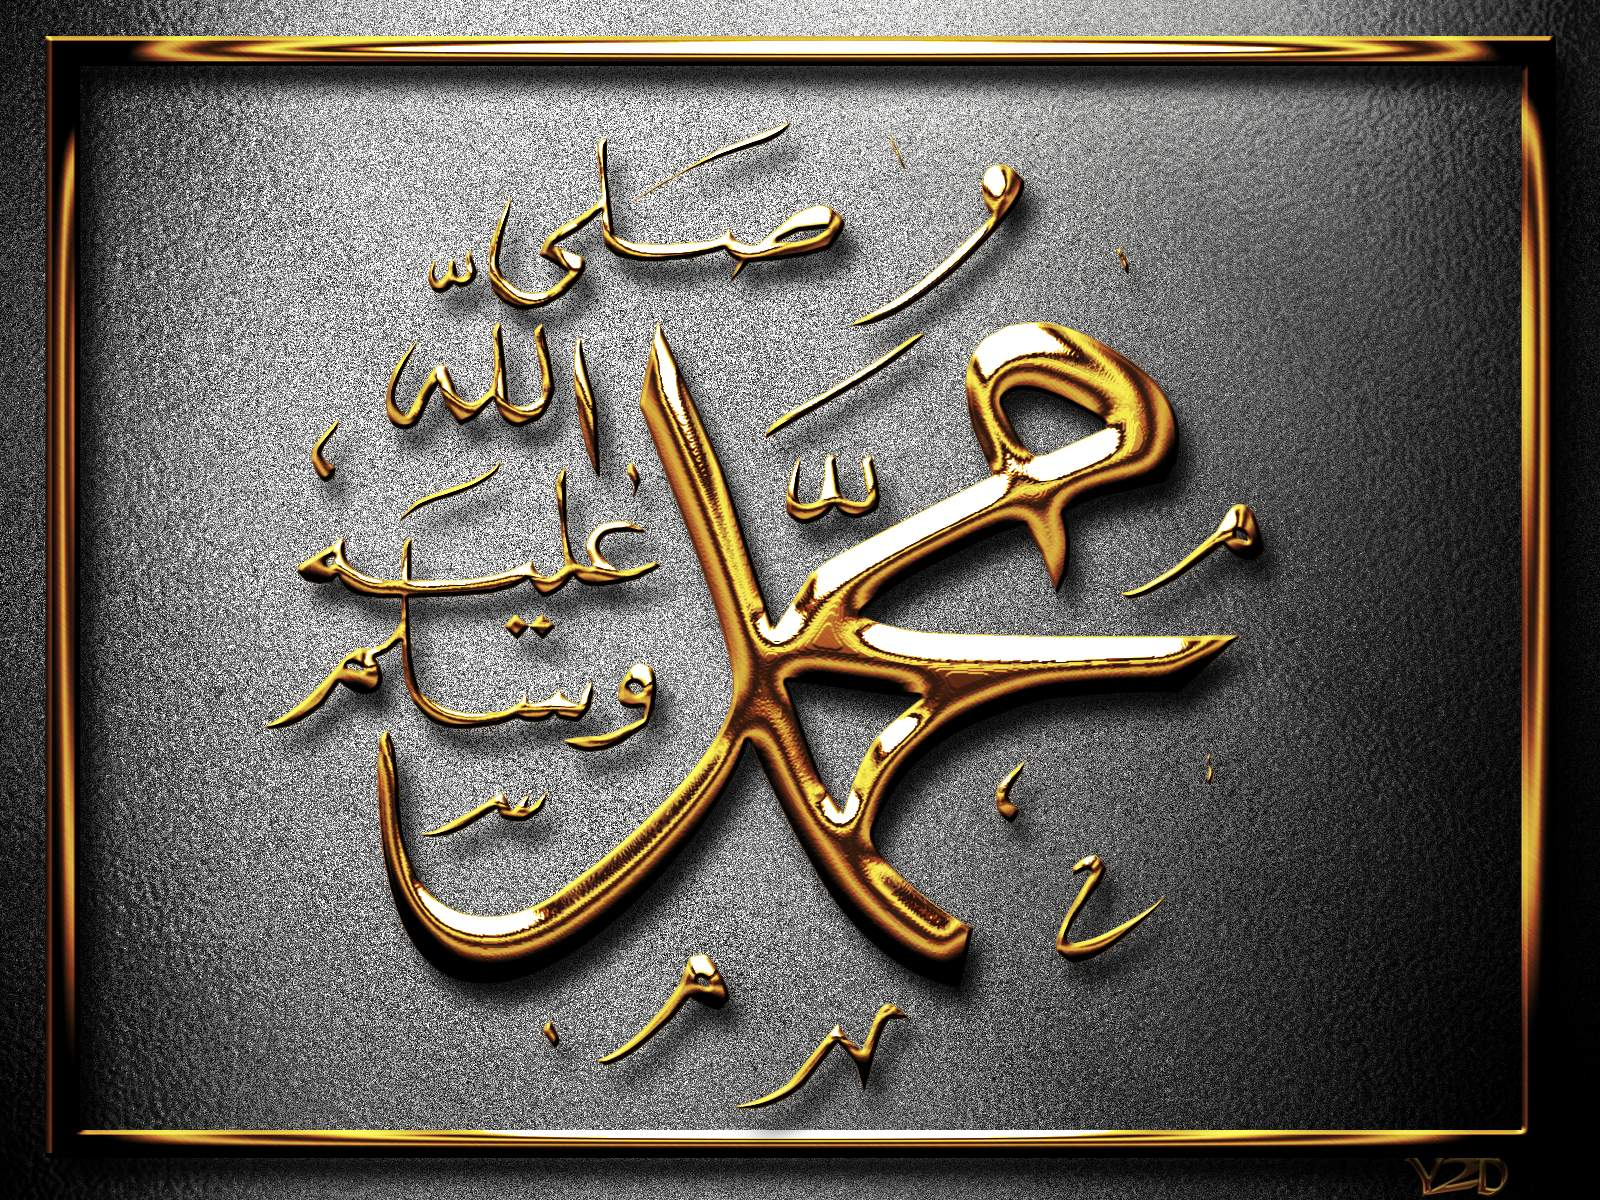 Wallpaper iphone kaligrafi - Wallpaper Iphone Kaligrafi 42